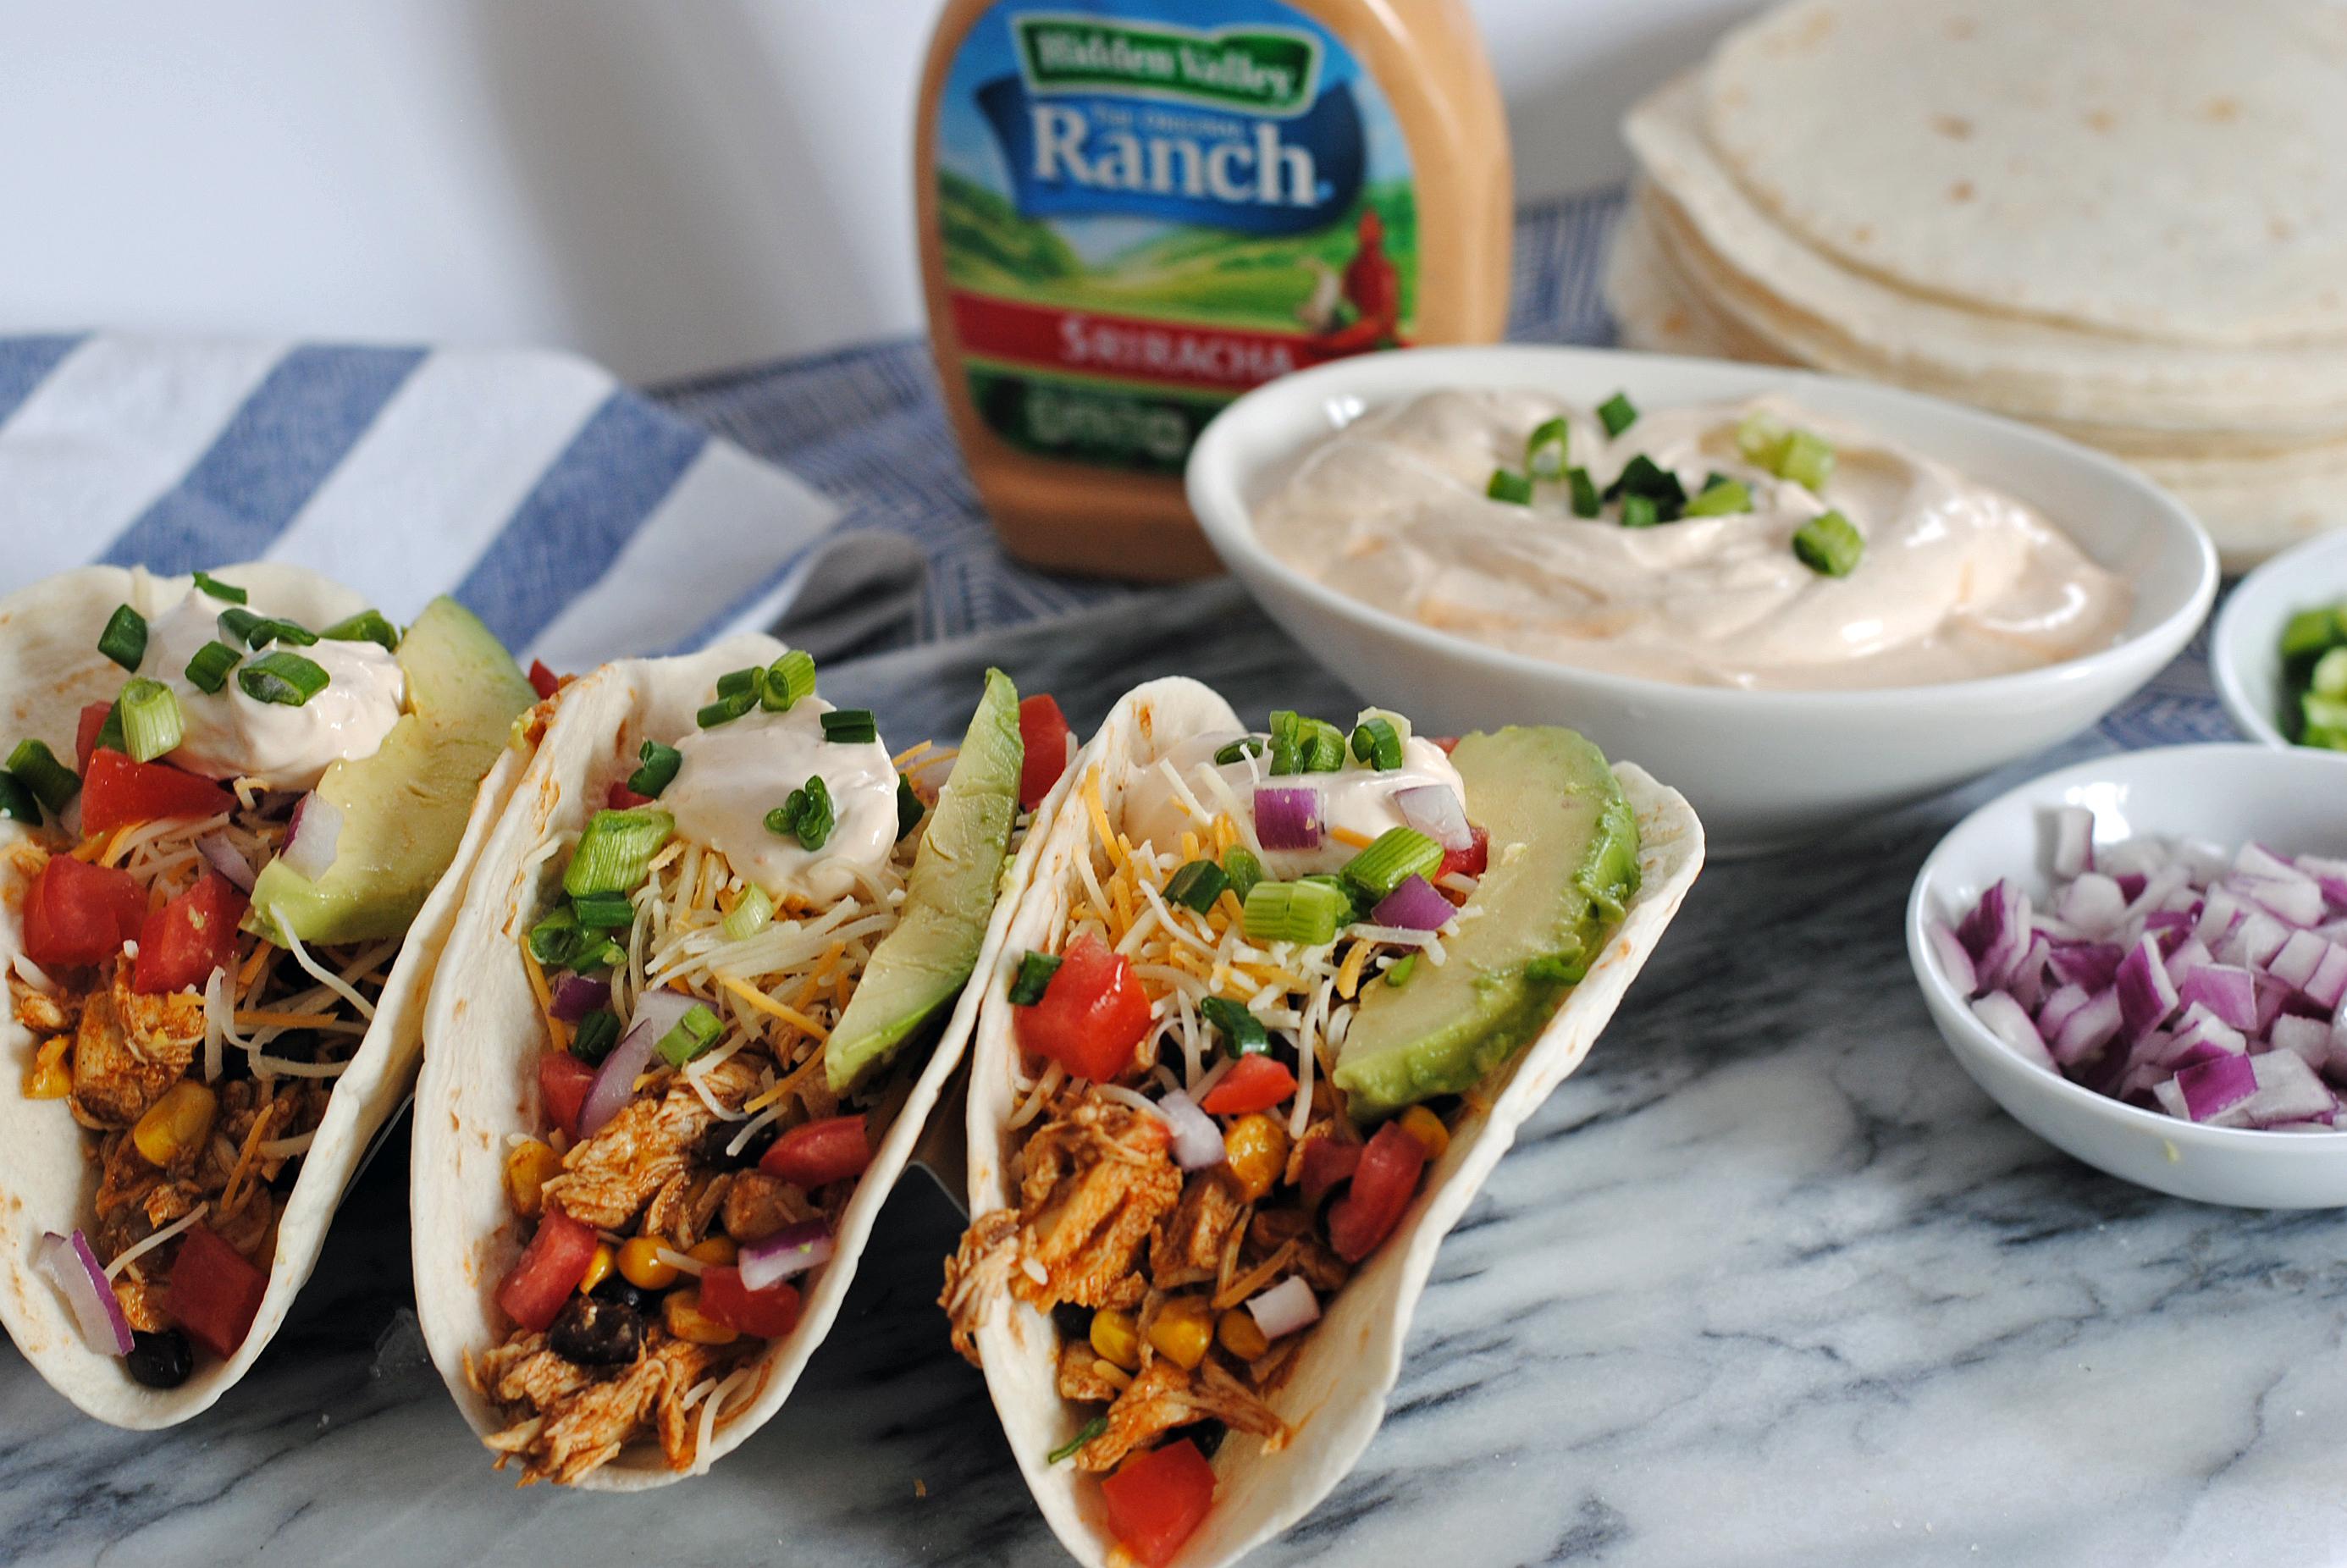 HVR Siracha Ranch Tacos 1